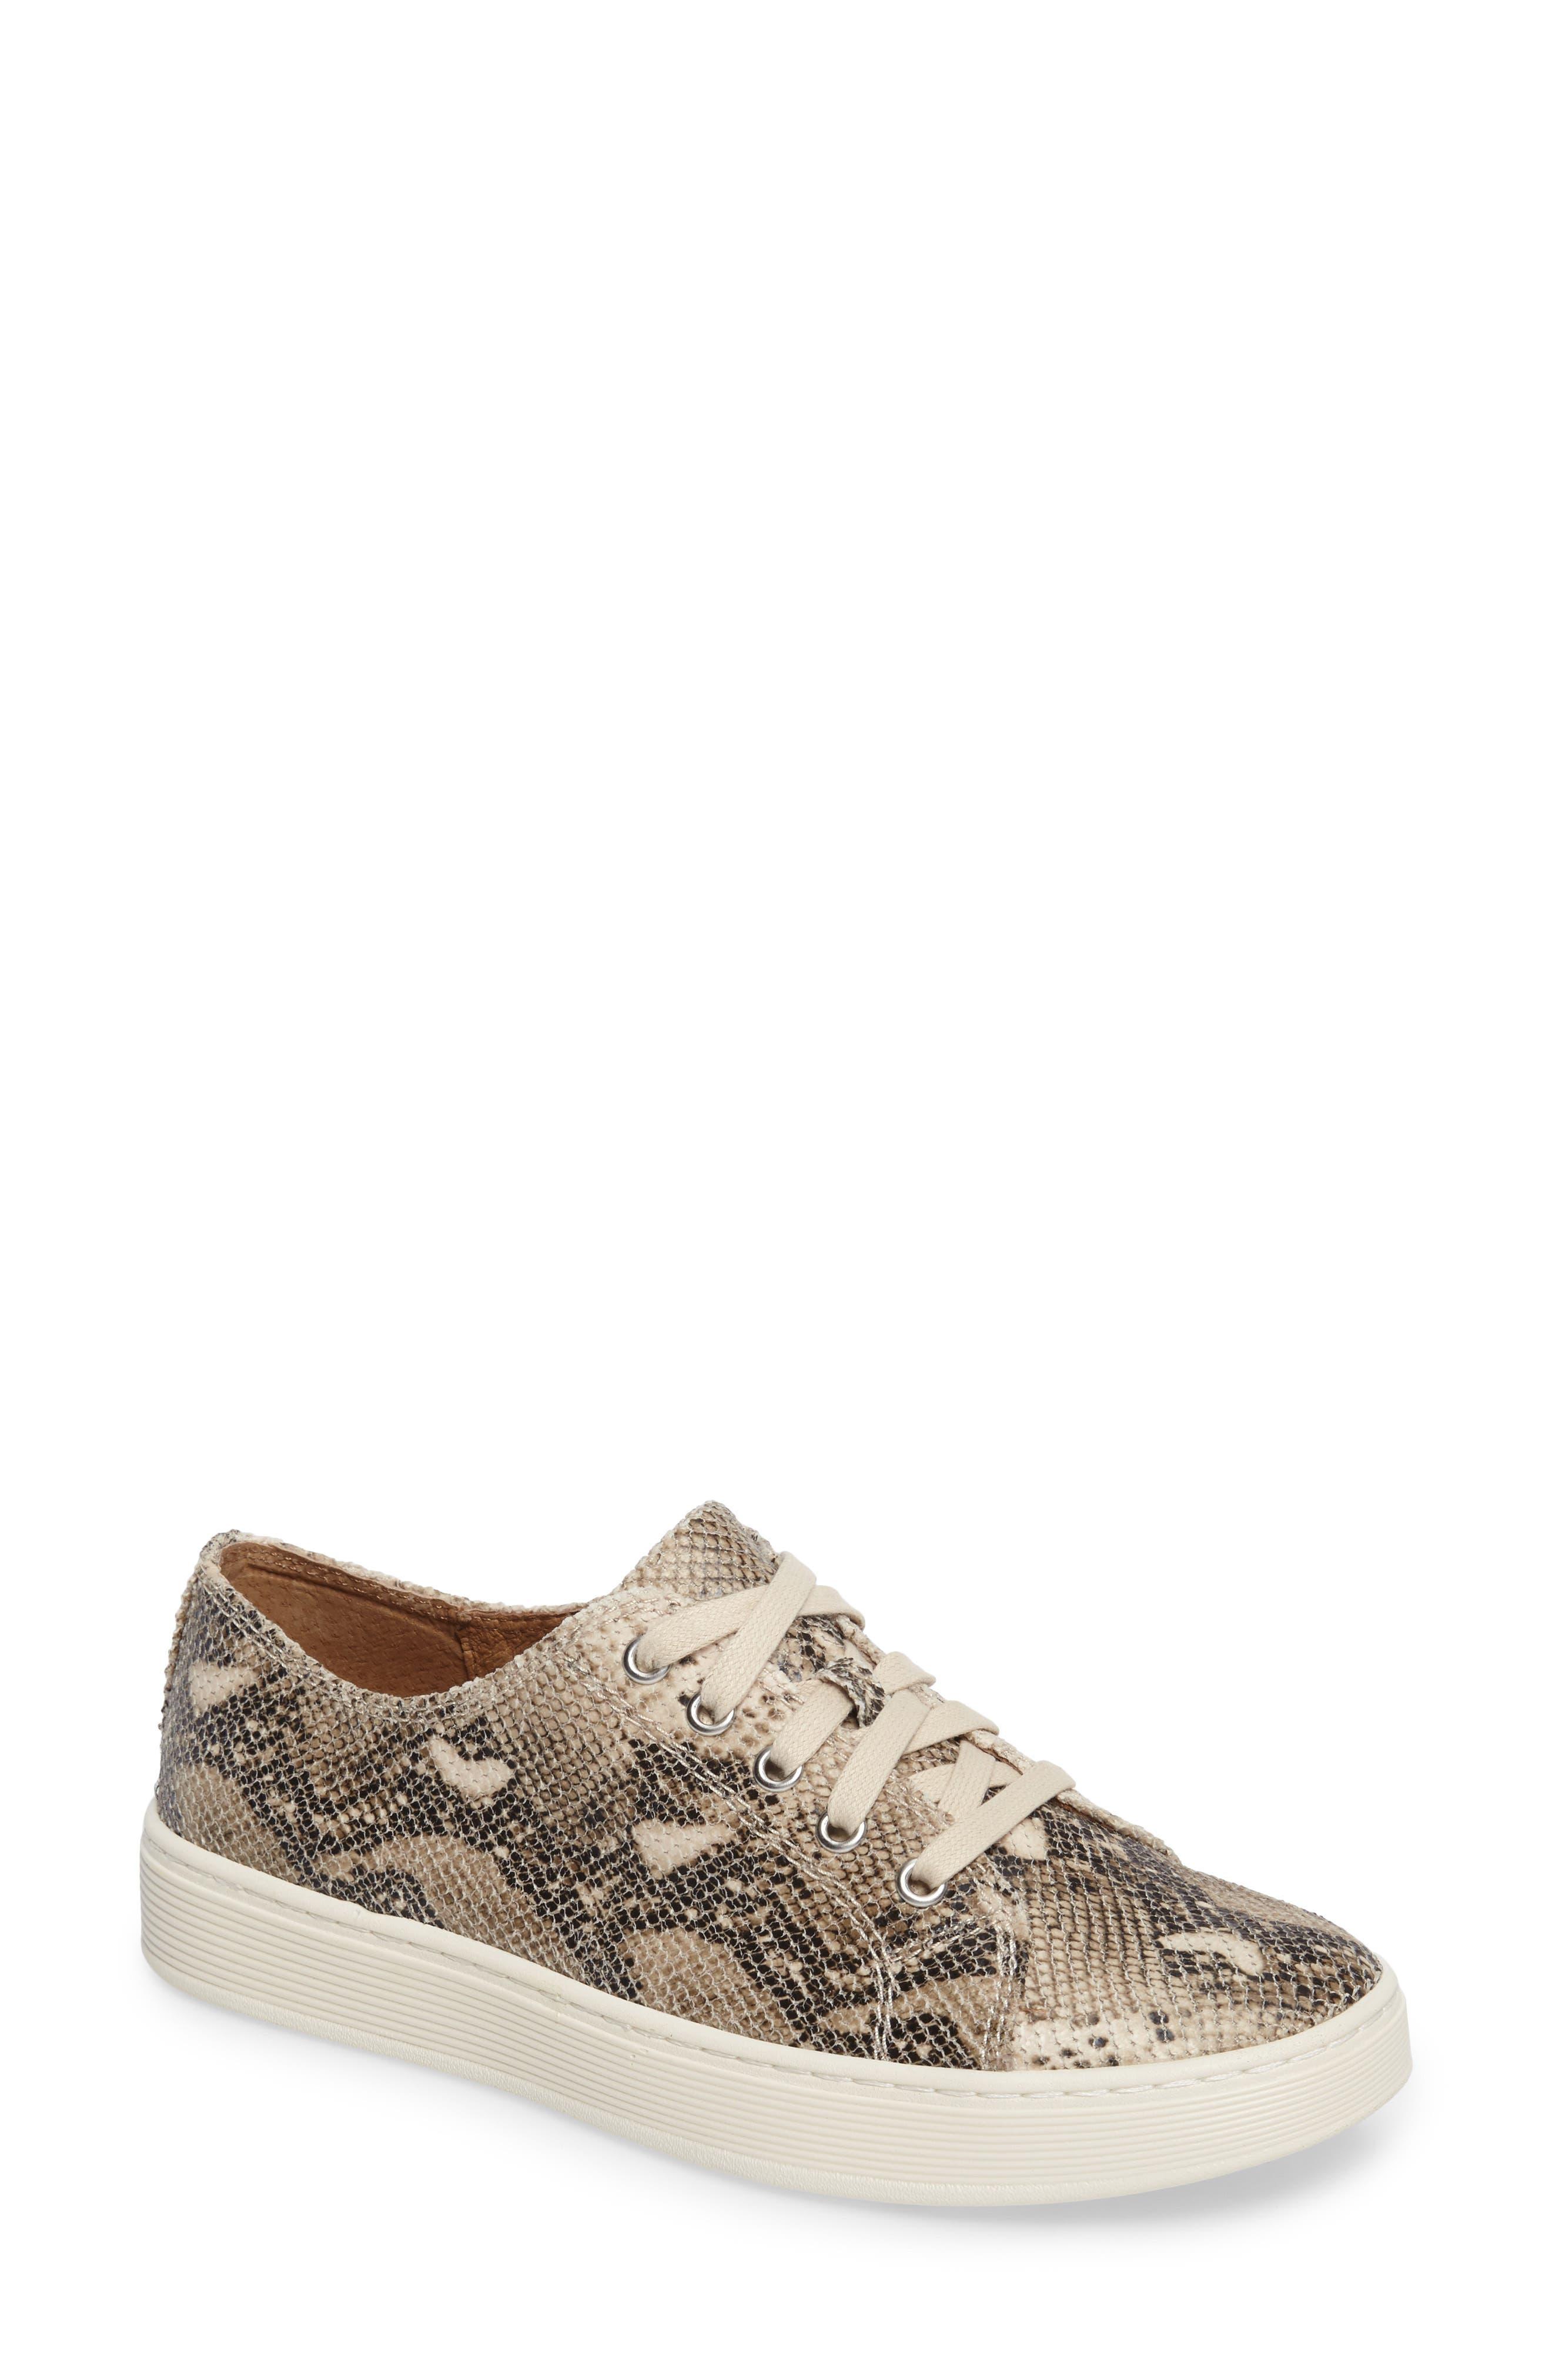 Söfft Baltazar Sneaker (Women)